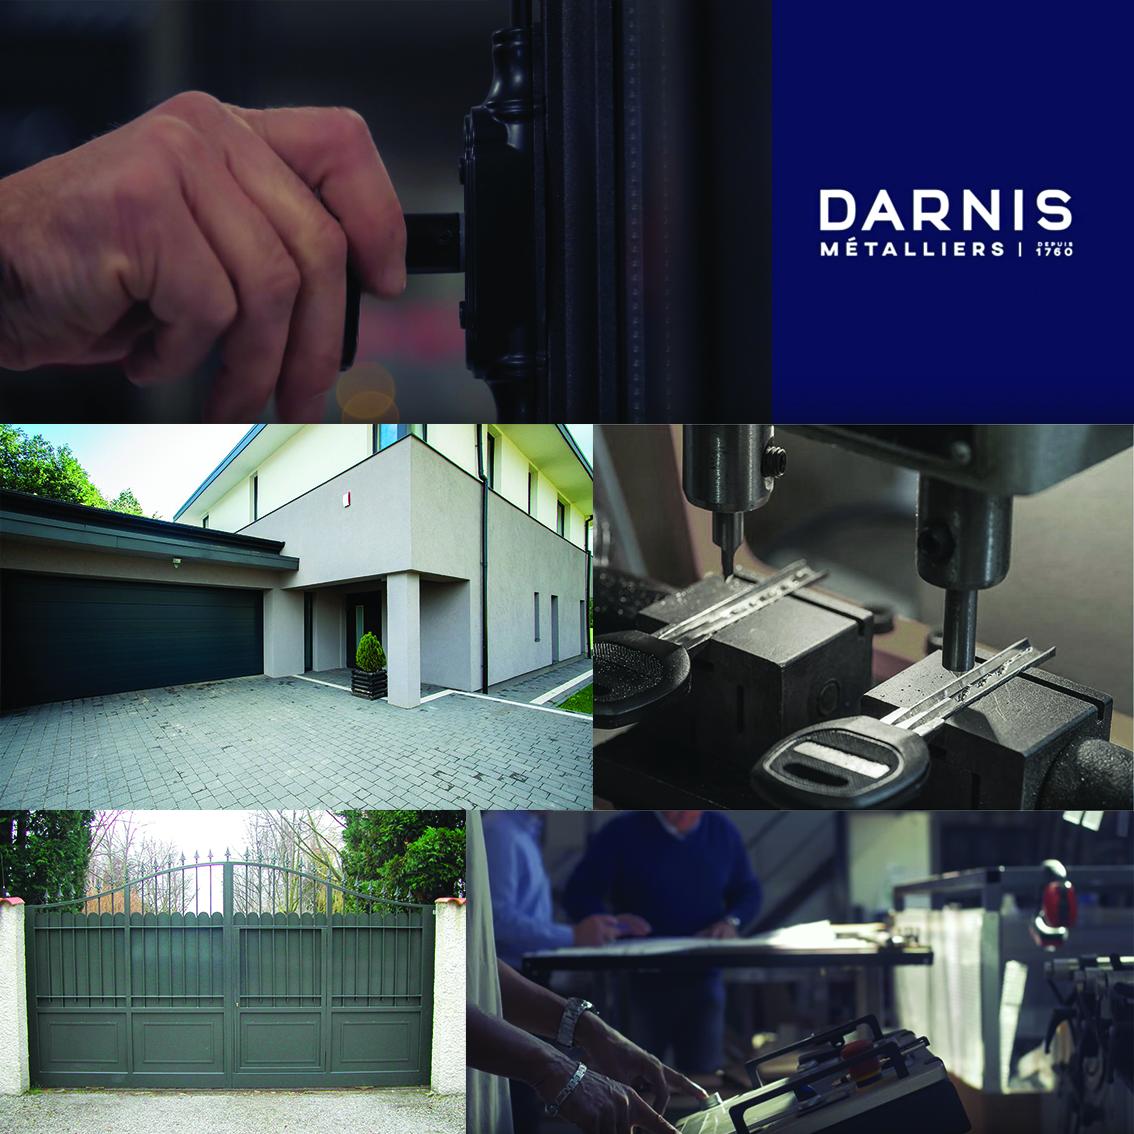 http://www.darnis-metallier.fr/wp-content/uploads/2018/04/DARNIS3.jpg